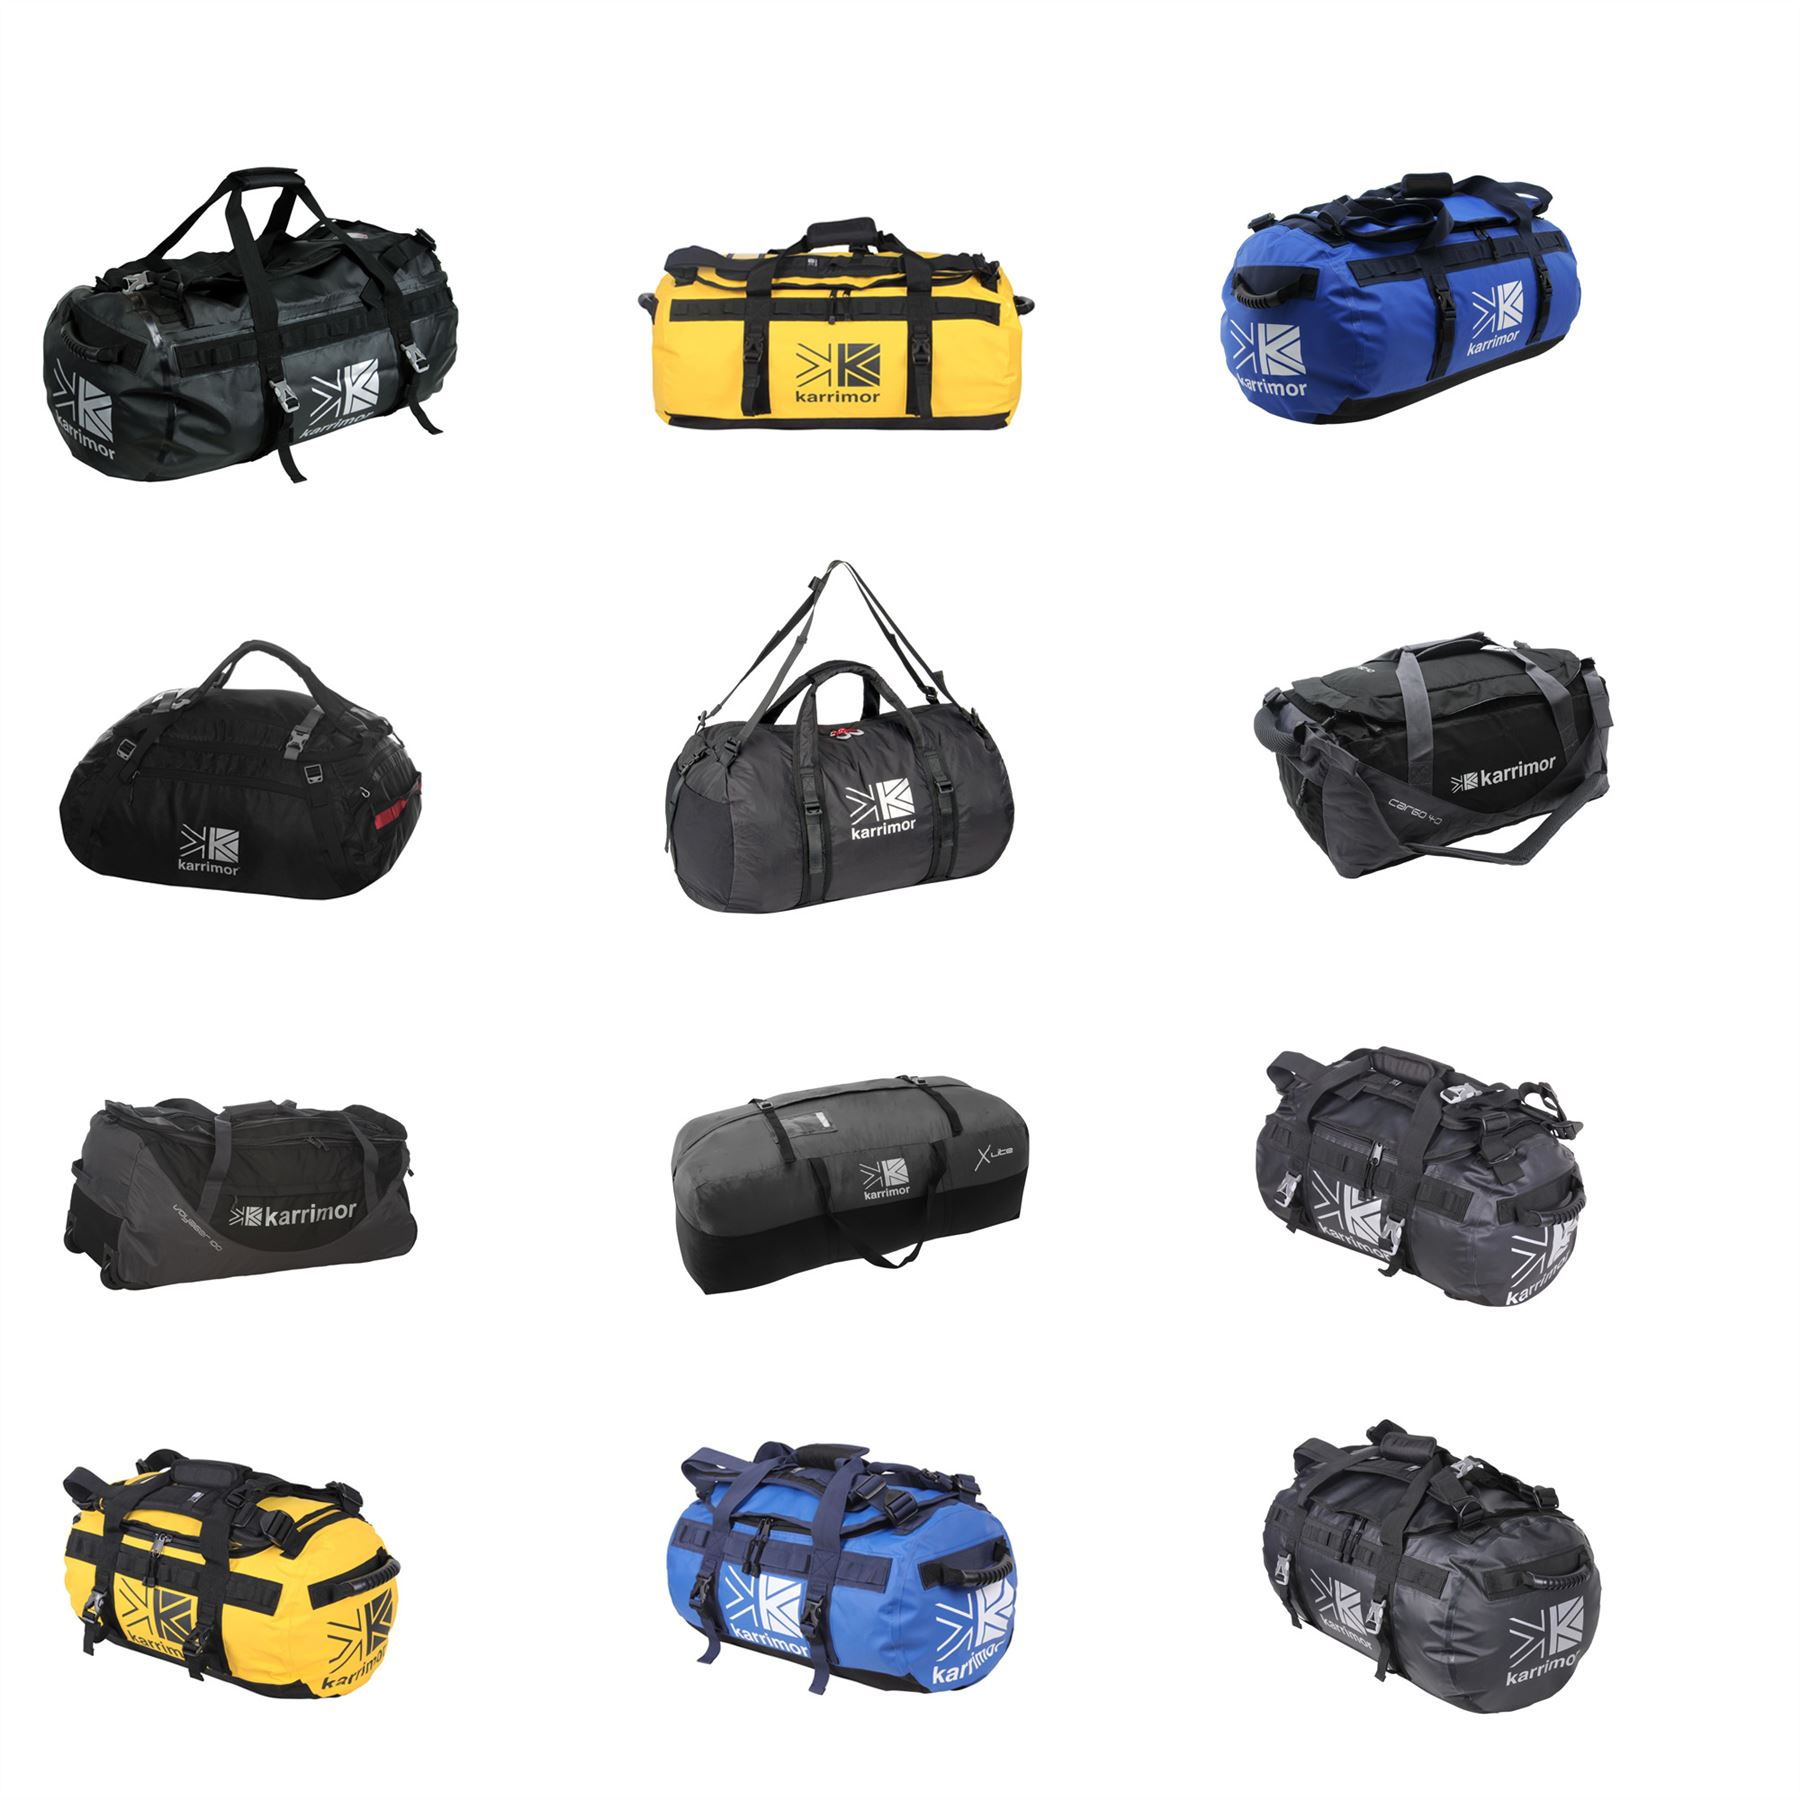 07f507dc3a24 Details about Karrimor Duffle Bags 40L 47L 65L 70L 90L Carryall Holdall  Barrel Bag Kitbag